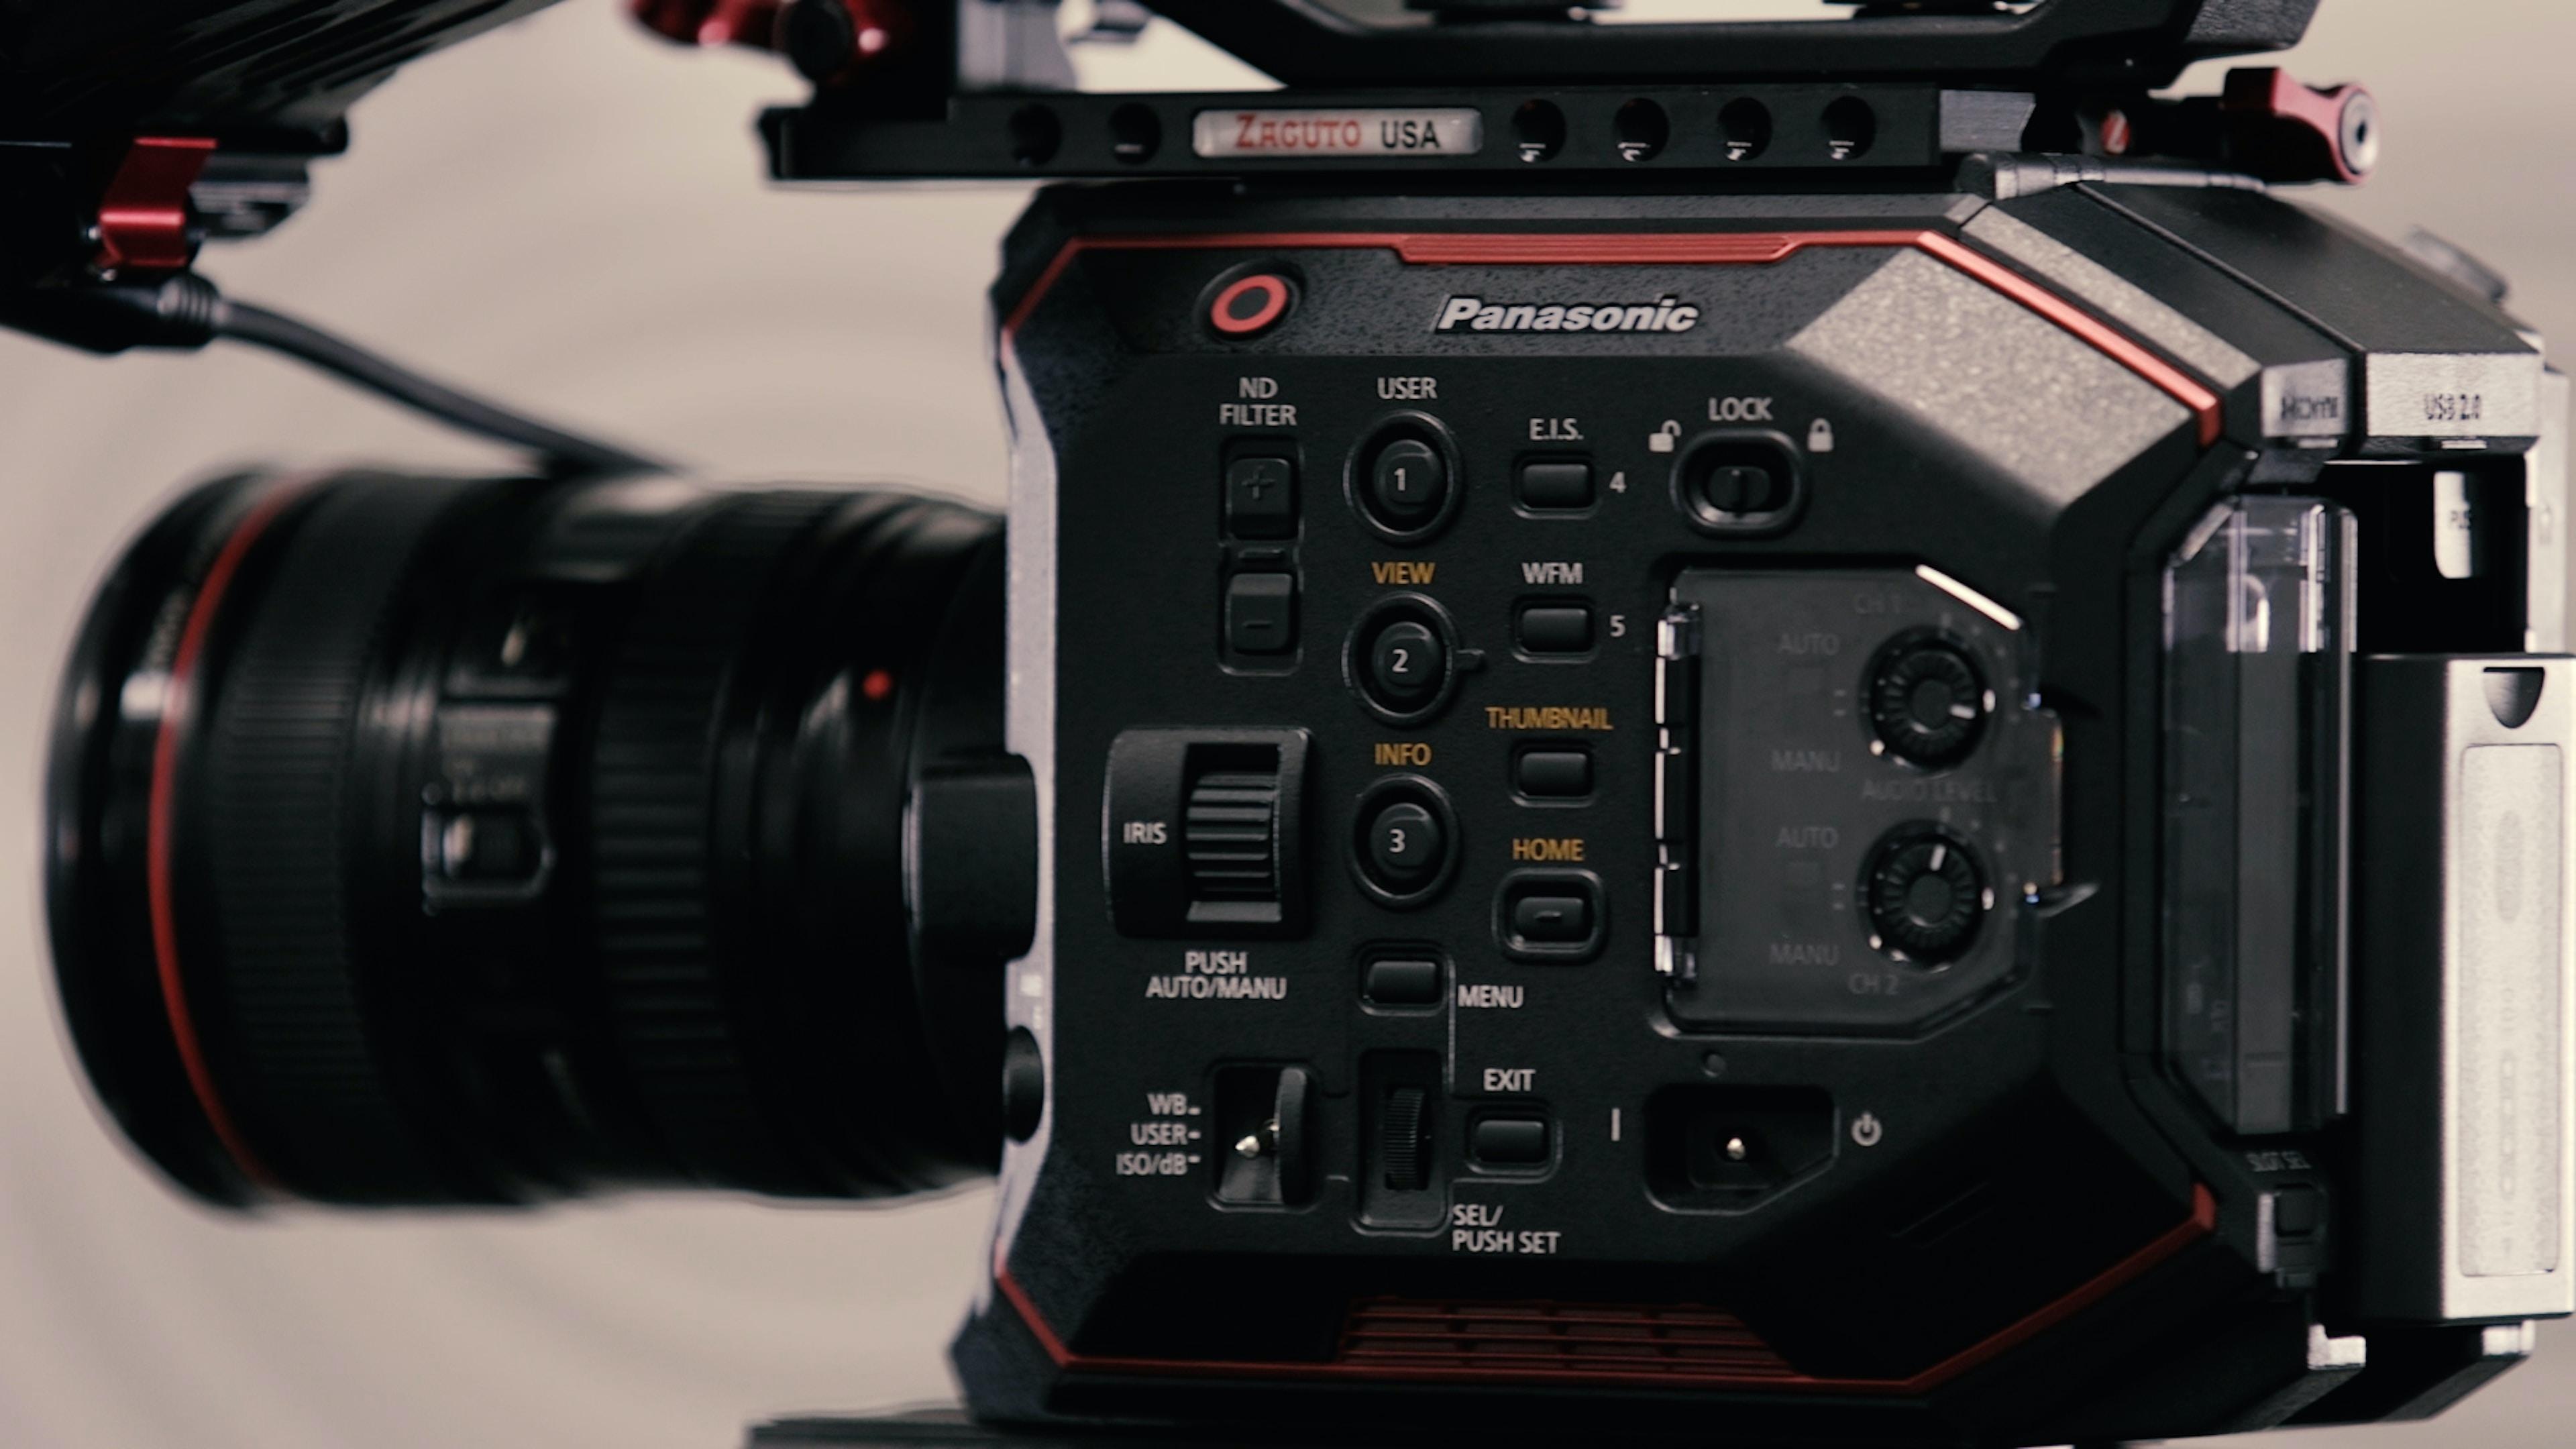 black Panasonic DSLR camera closeup photo